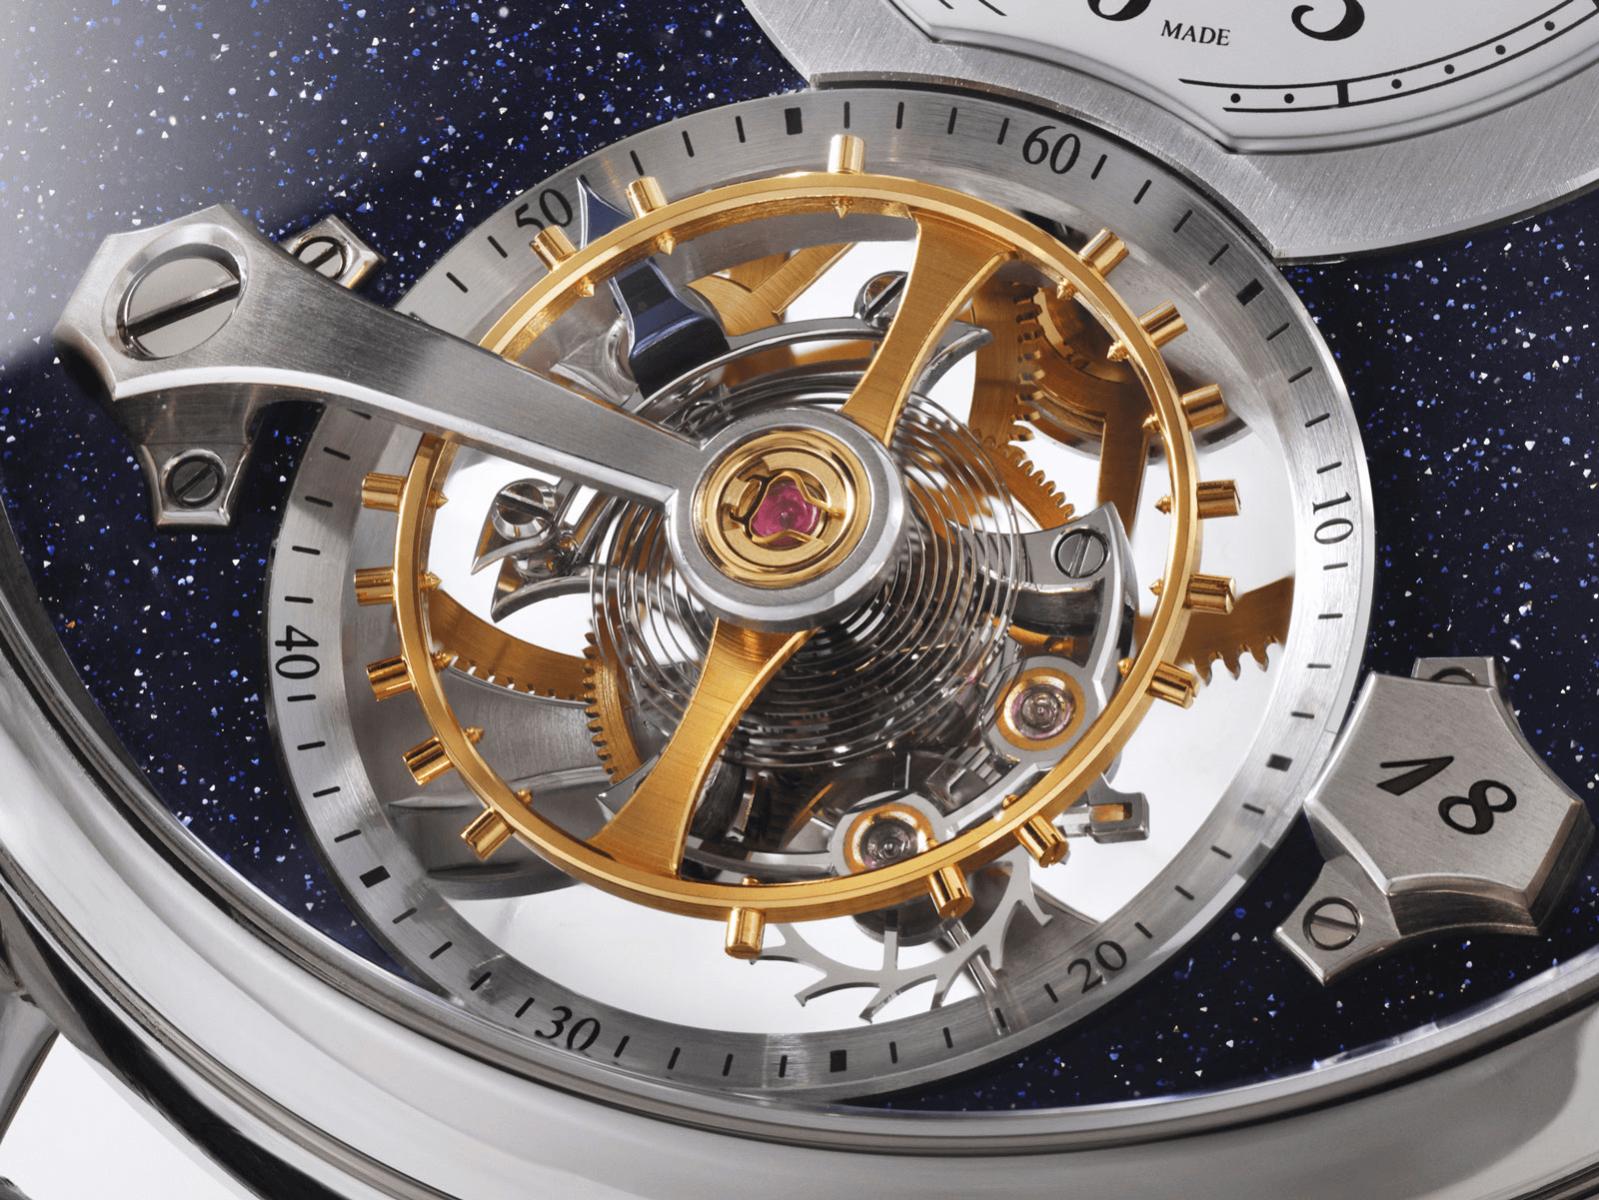 đồng hồ tourbillon montblanc star legacy tourbillon 2021